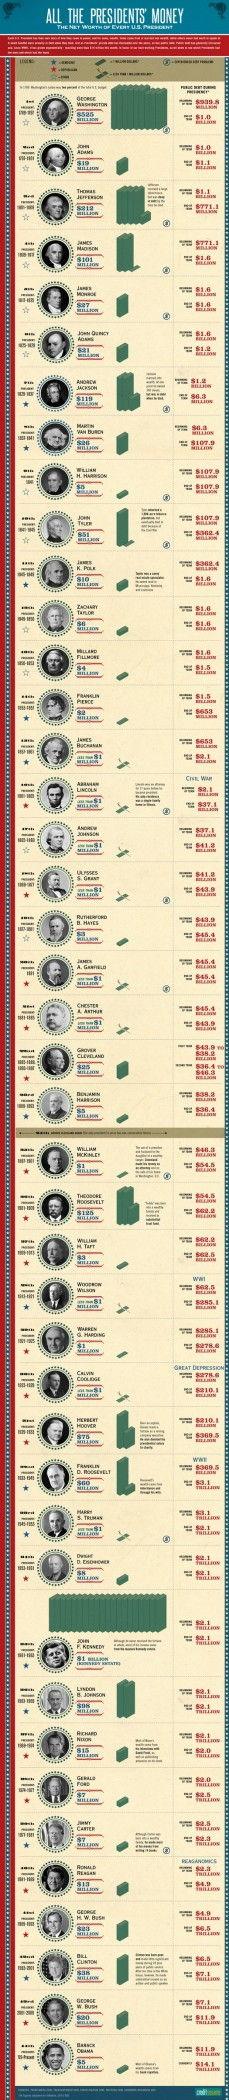 Net Worth of American Presidents vs. National Debt